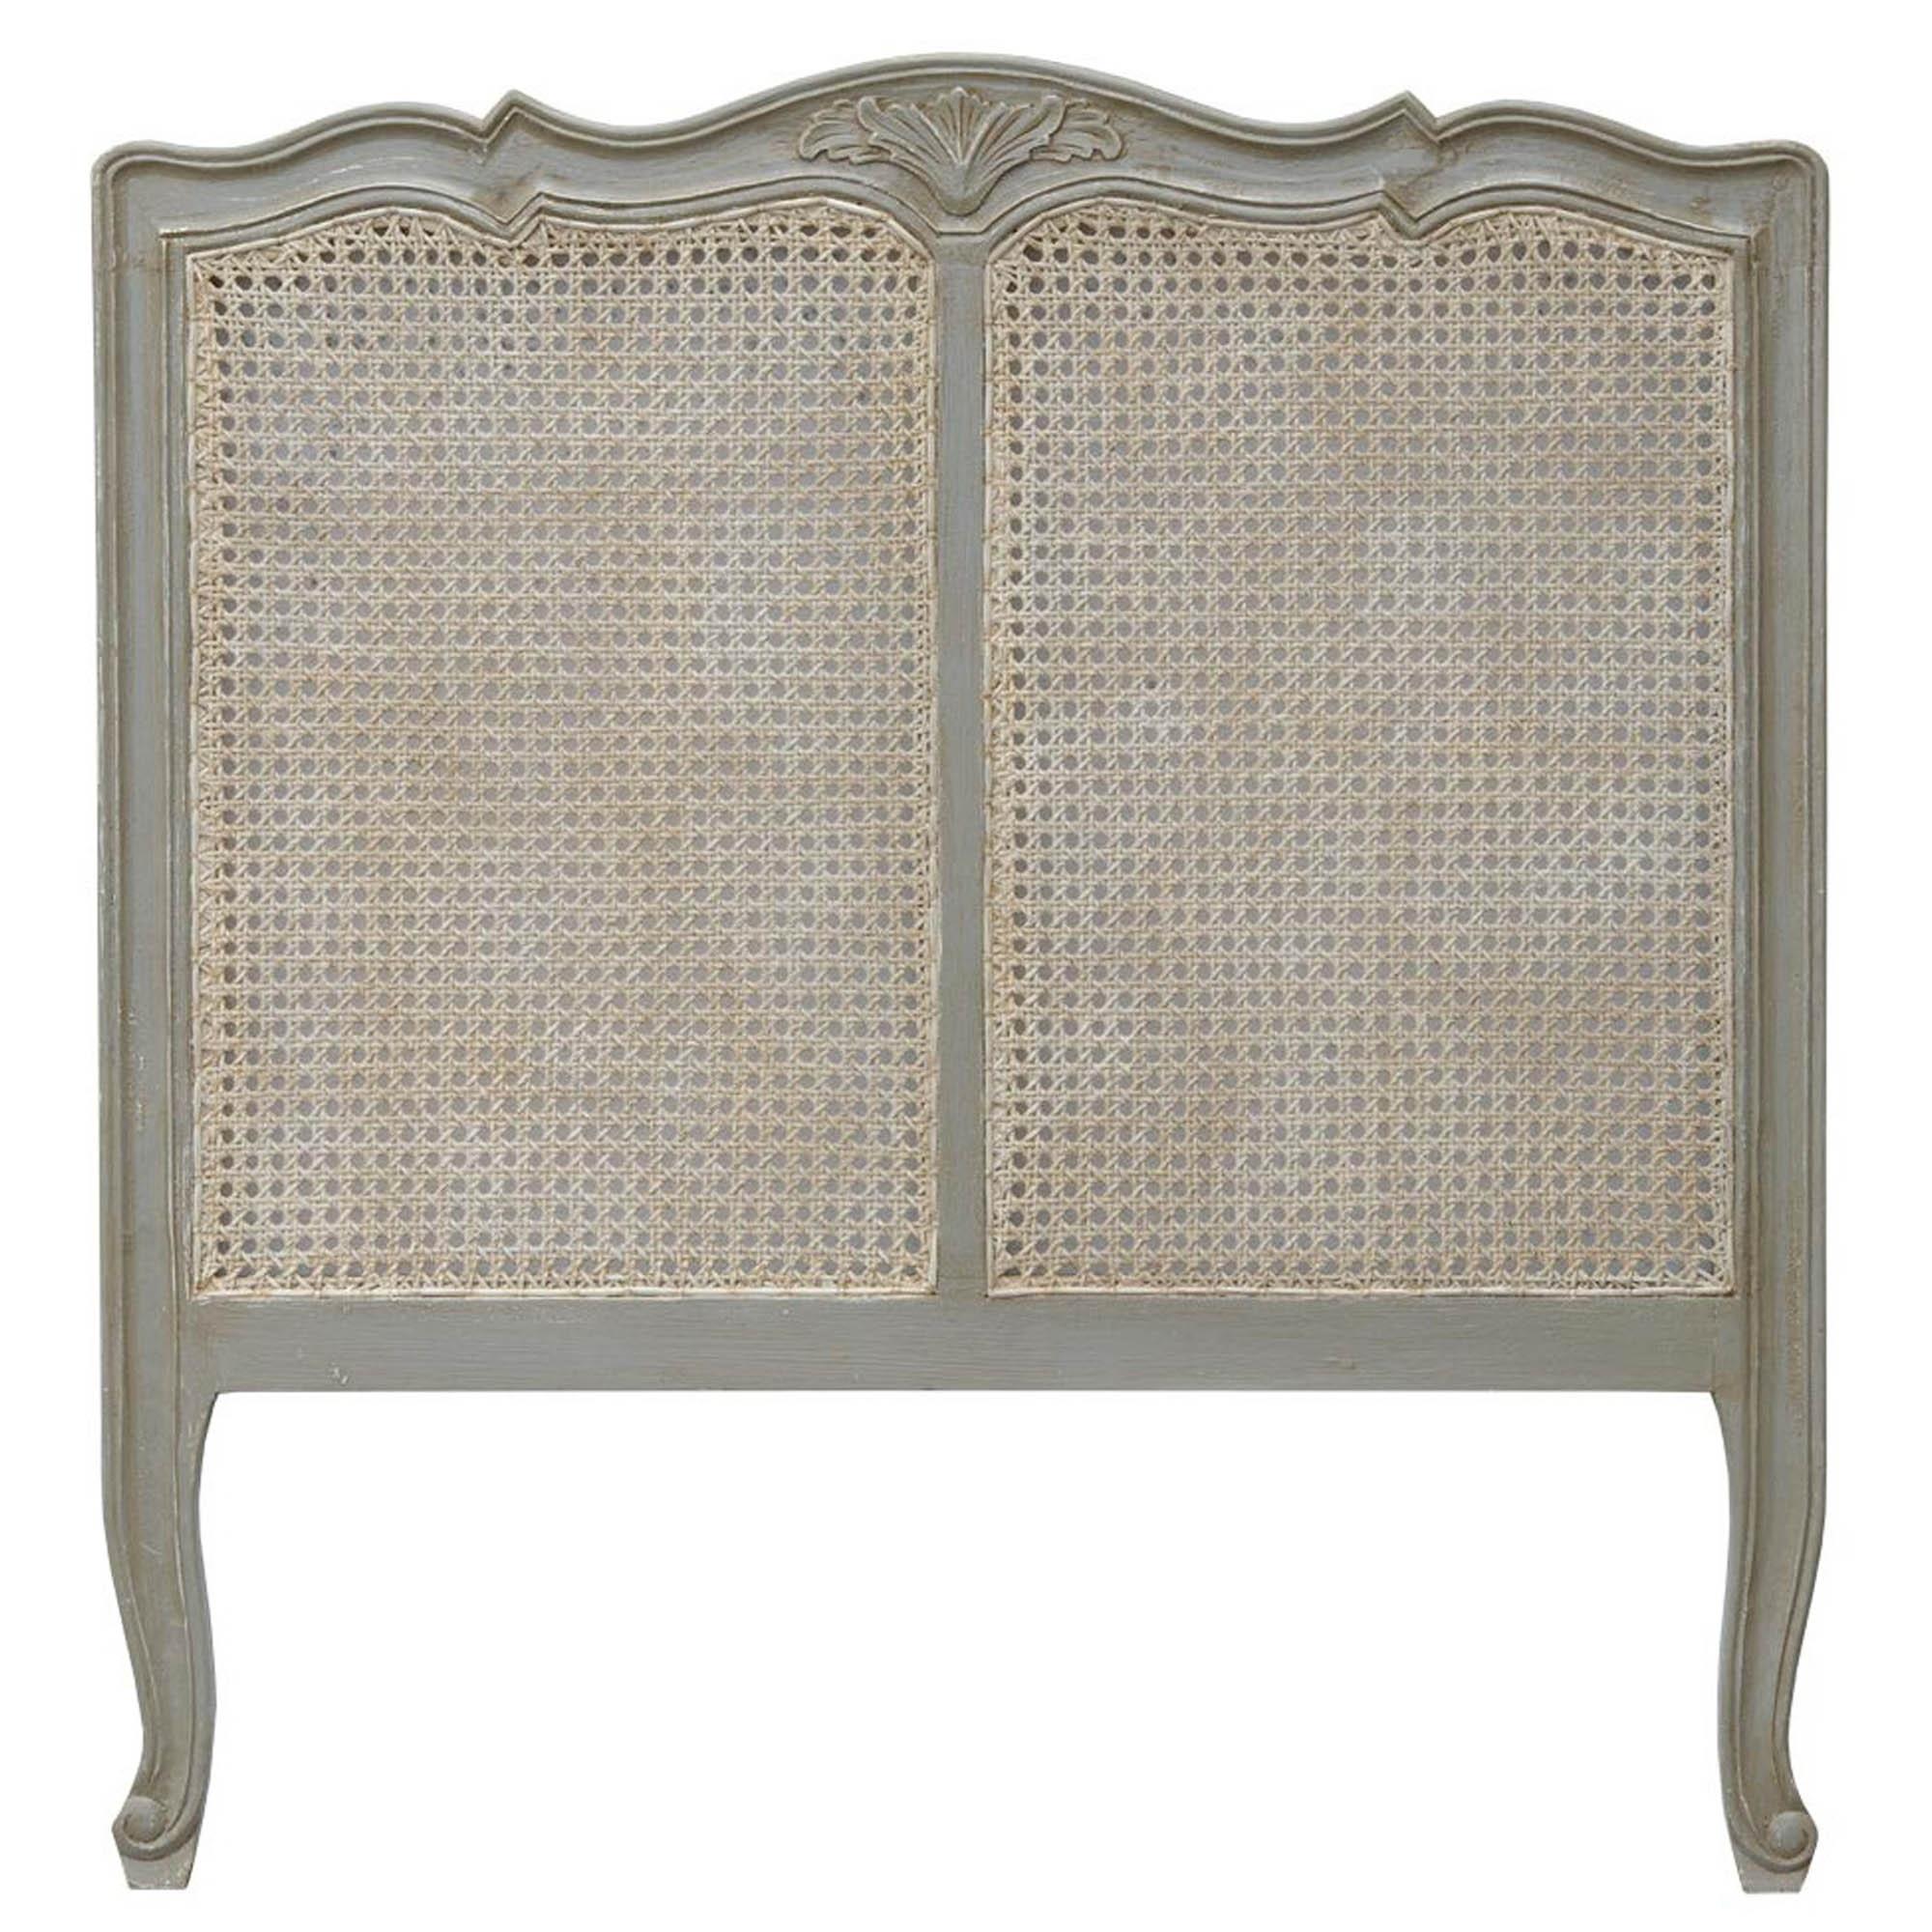 Dusk Grey: Isabella Dusk Grey Antique French Style Headboard